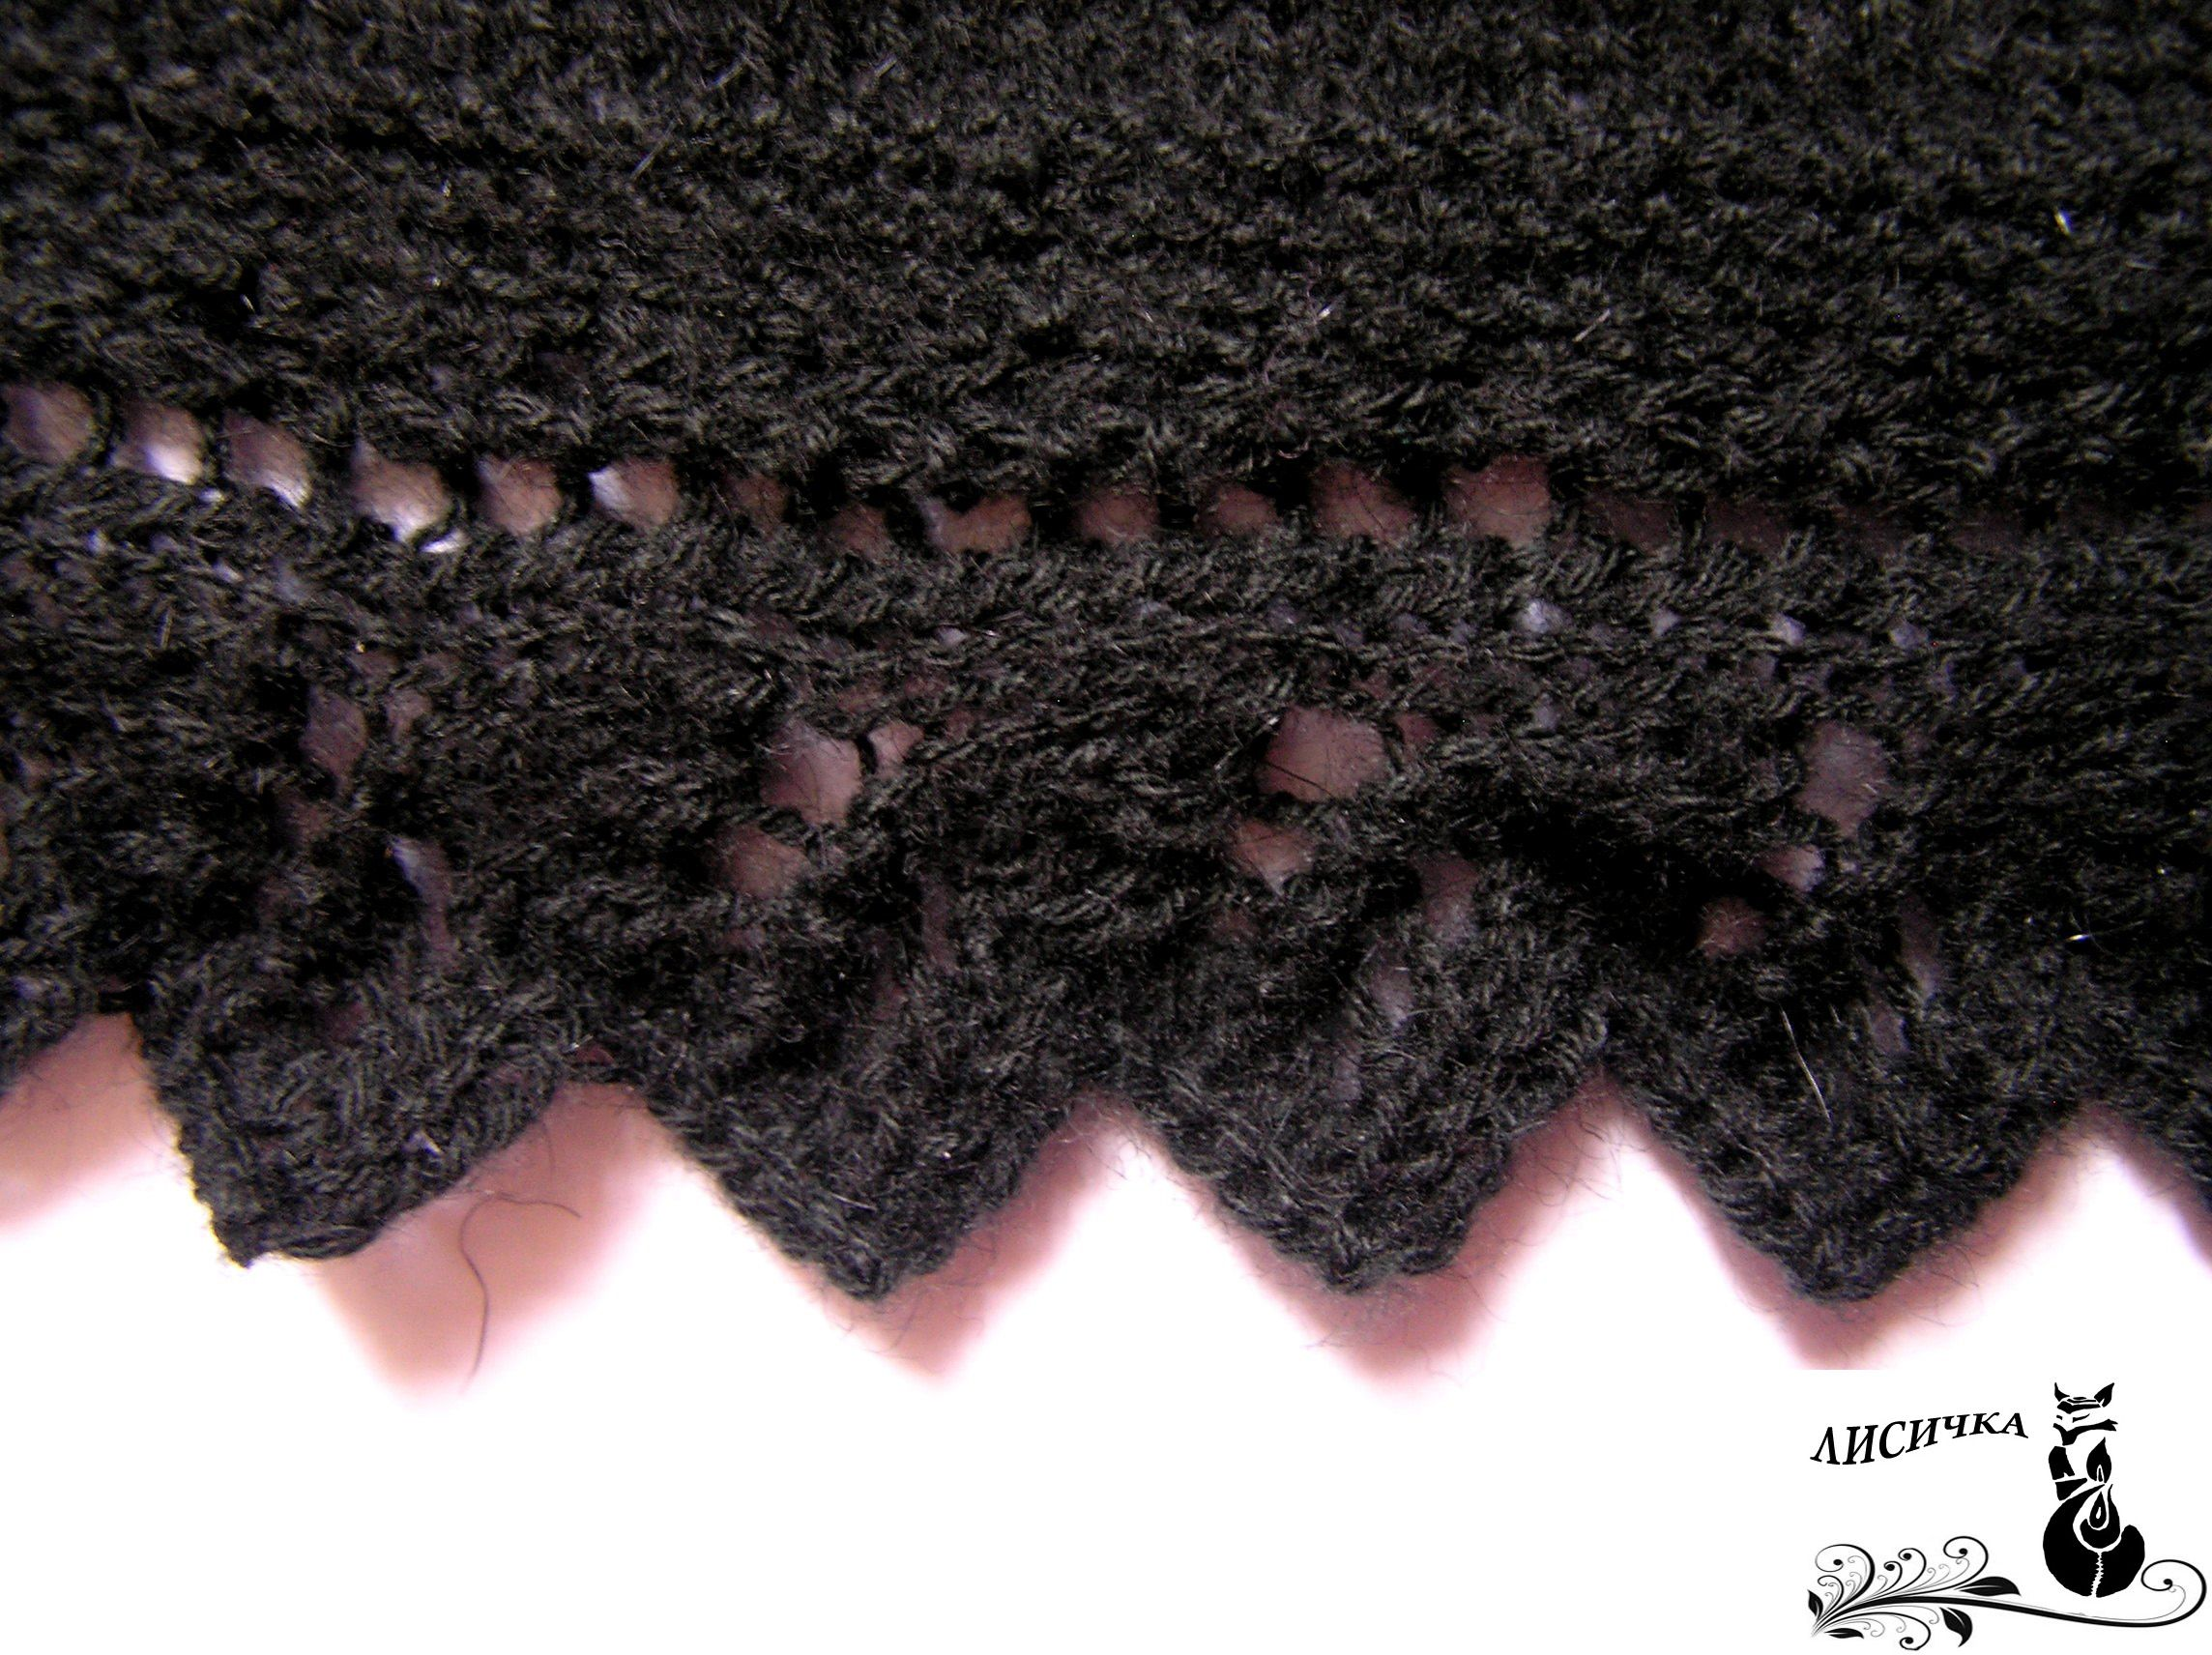 зимняякофточка вязанаяблуза кофточкаспицами вязанаякофточка зимняяблуза кофточка блуза